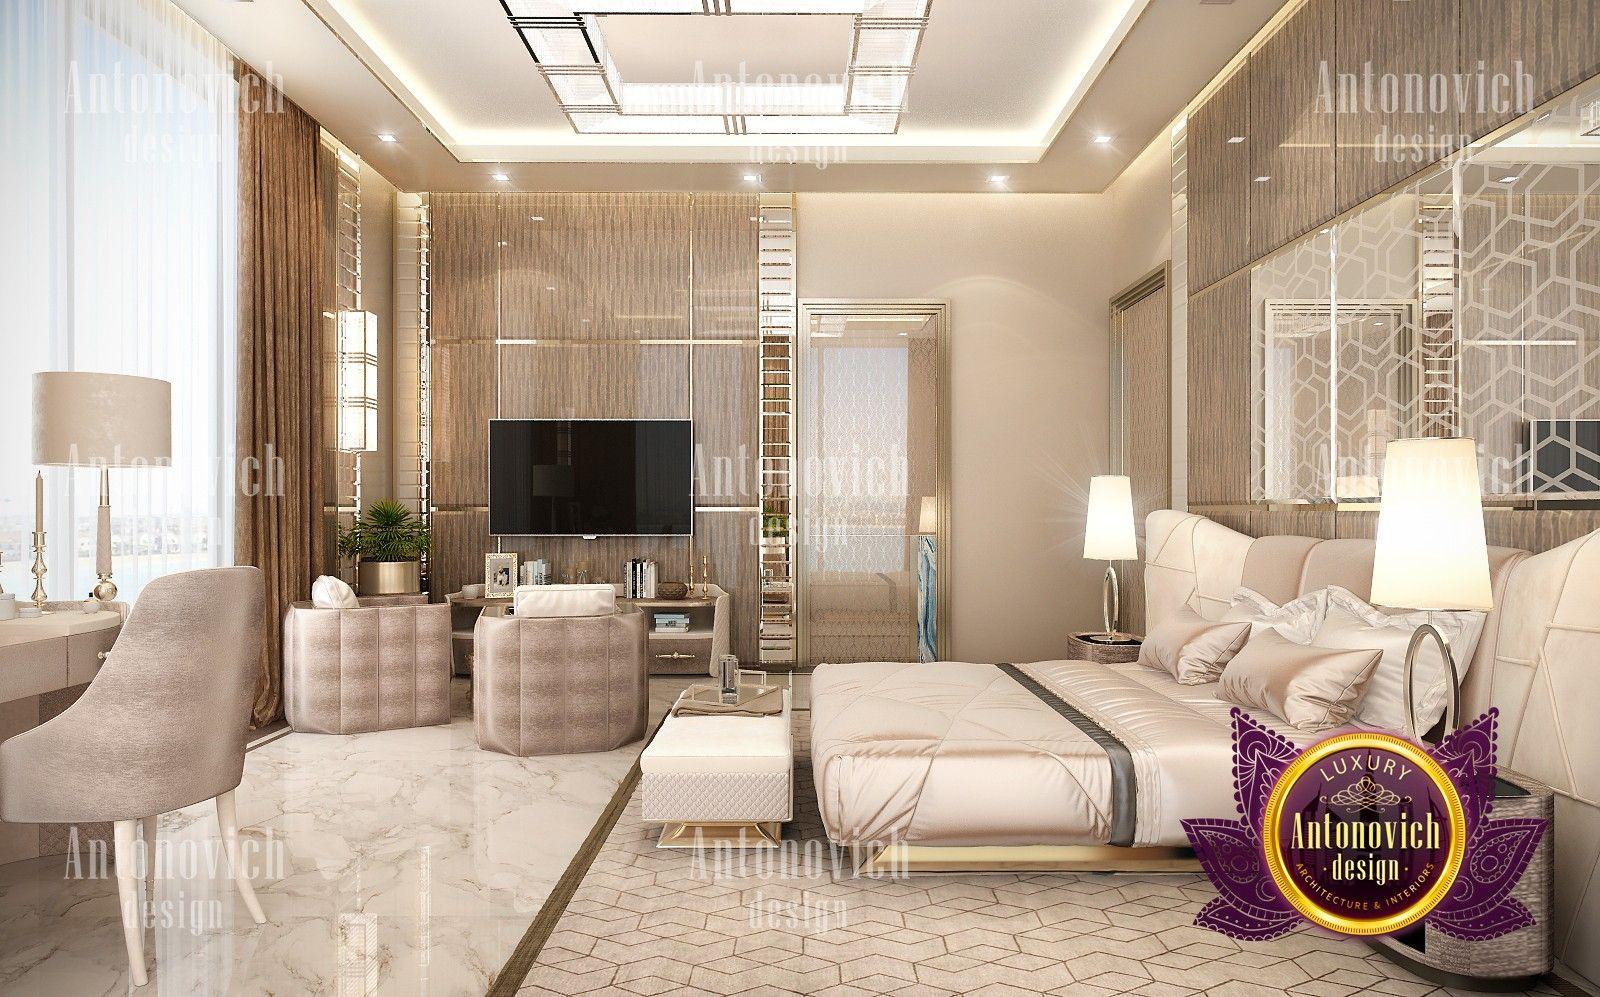 Marvellous Bedroom Design Idea